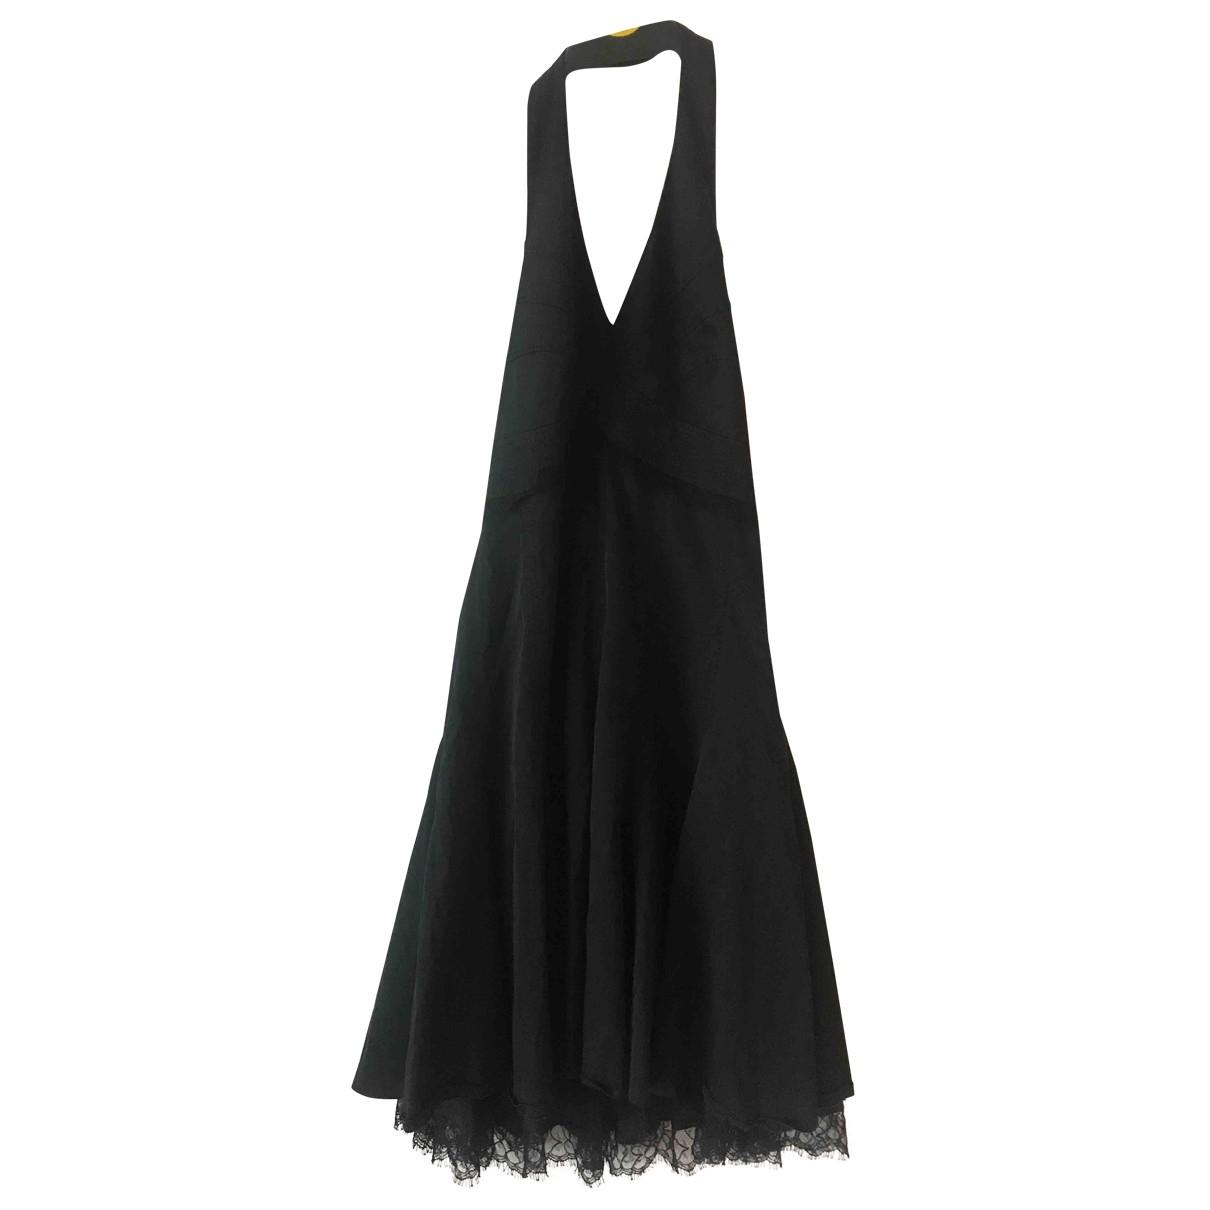 Karen Millen \N Black Cotton dress for Women 8 UK